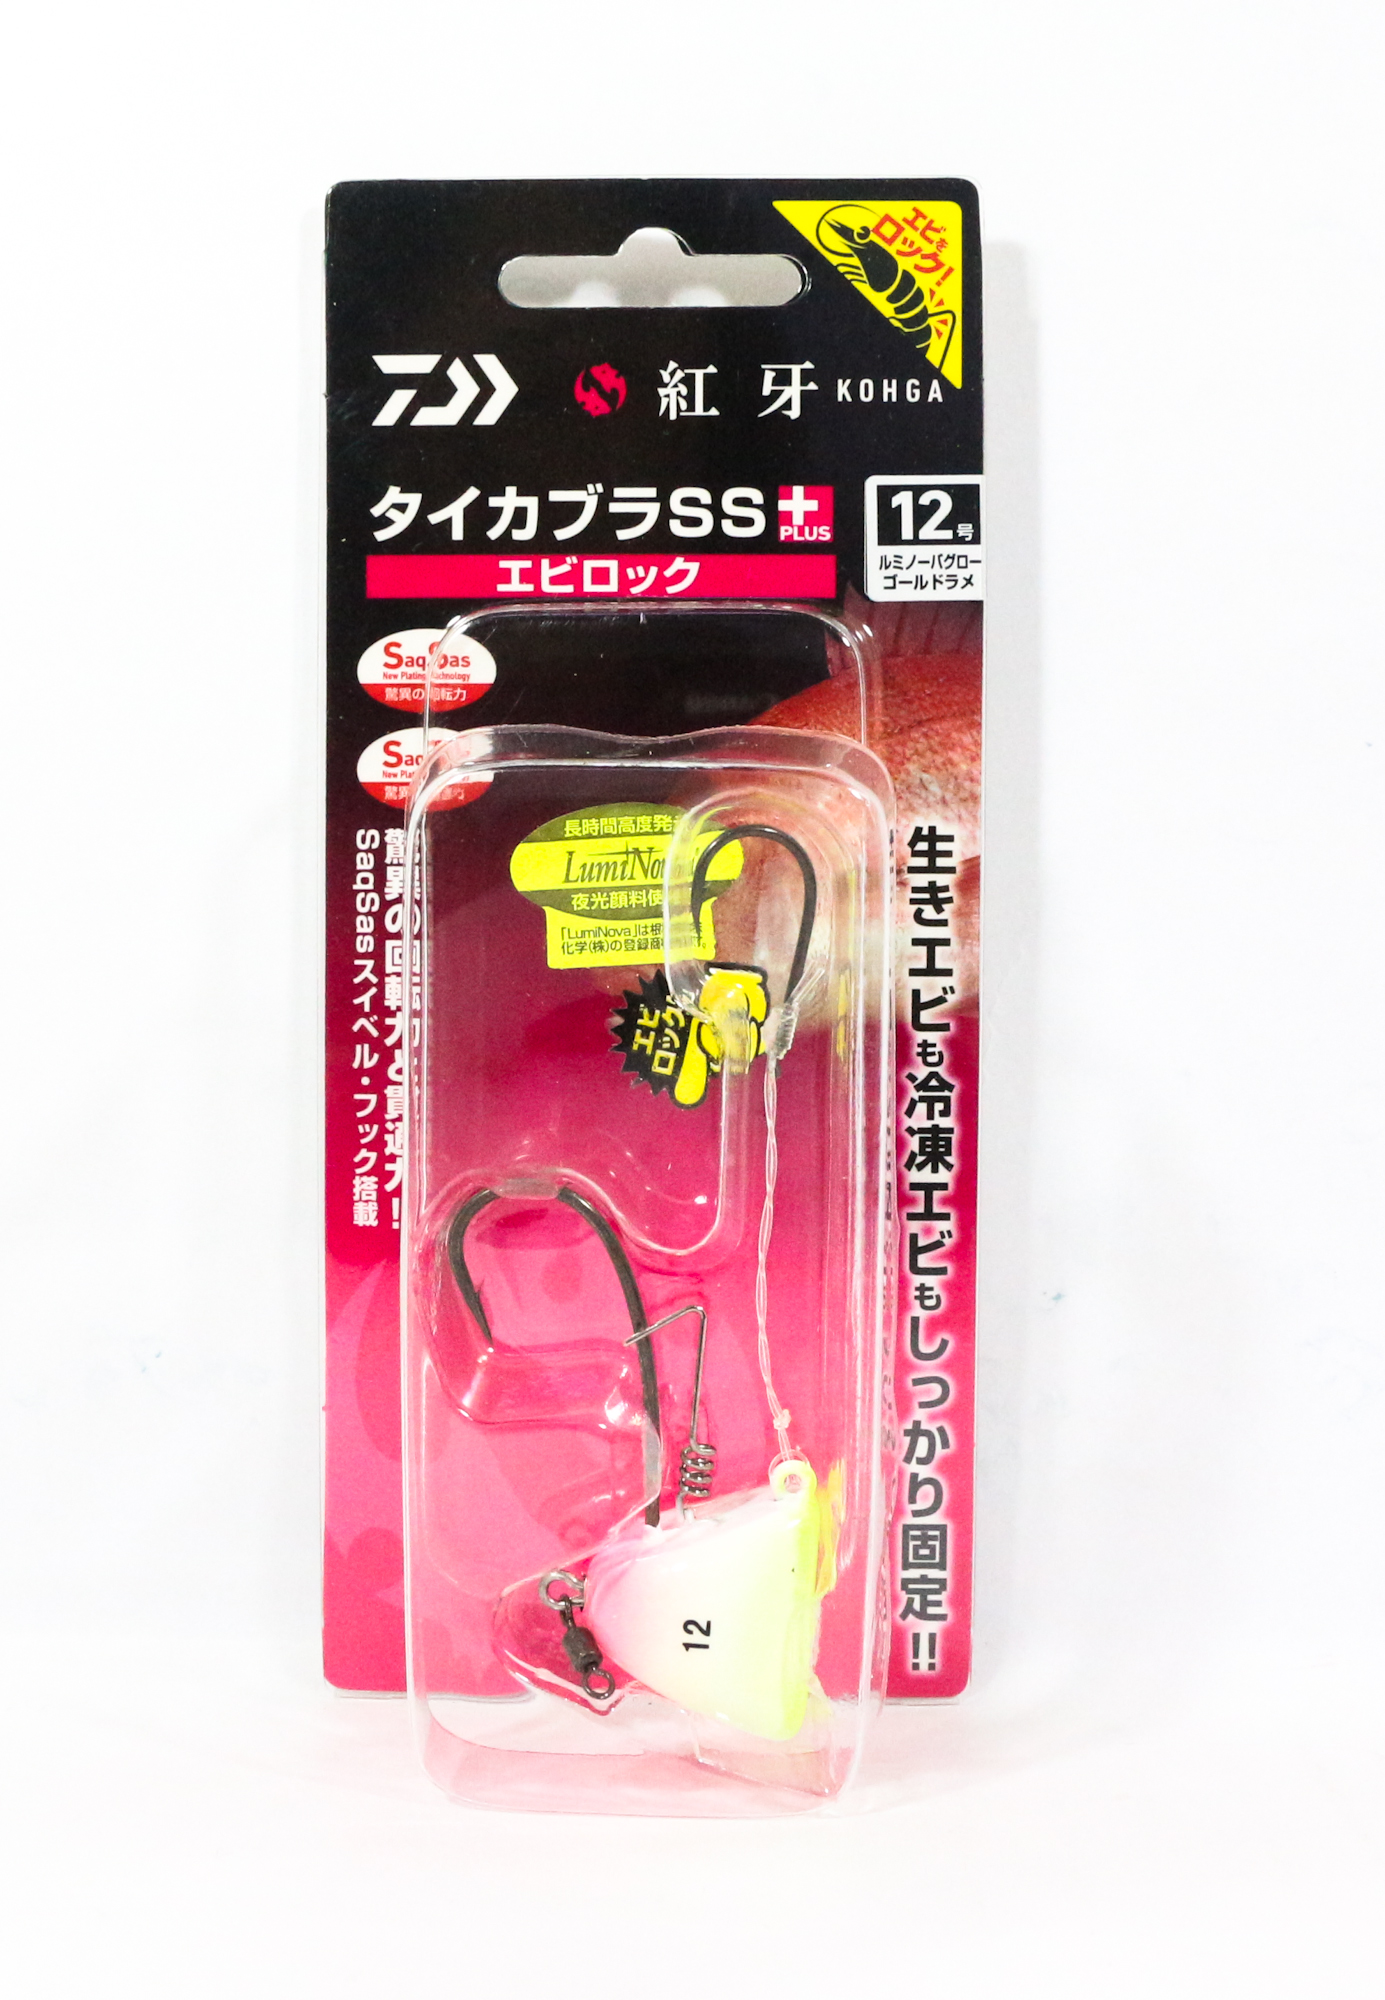 Daiwa Kabura SS+ Tenya Jig Size 12 L Glow Candy 003219